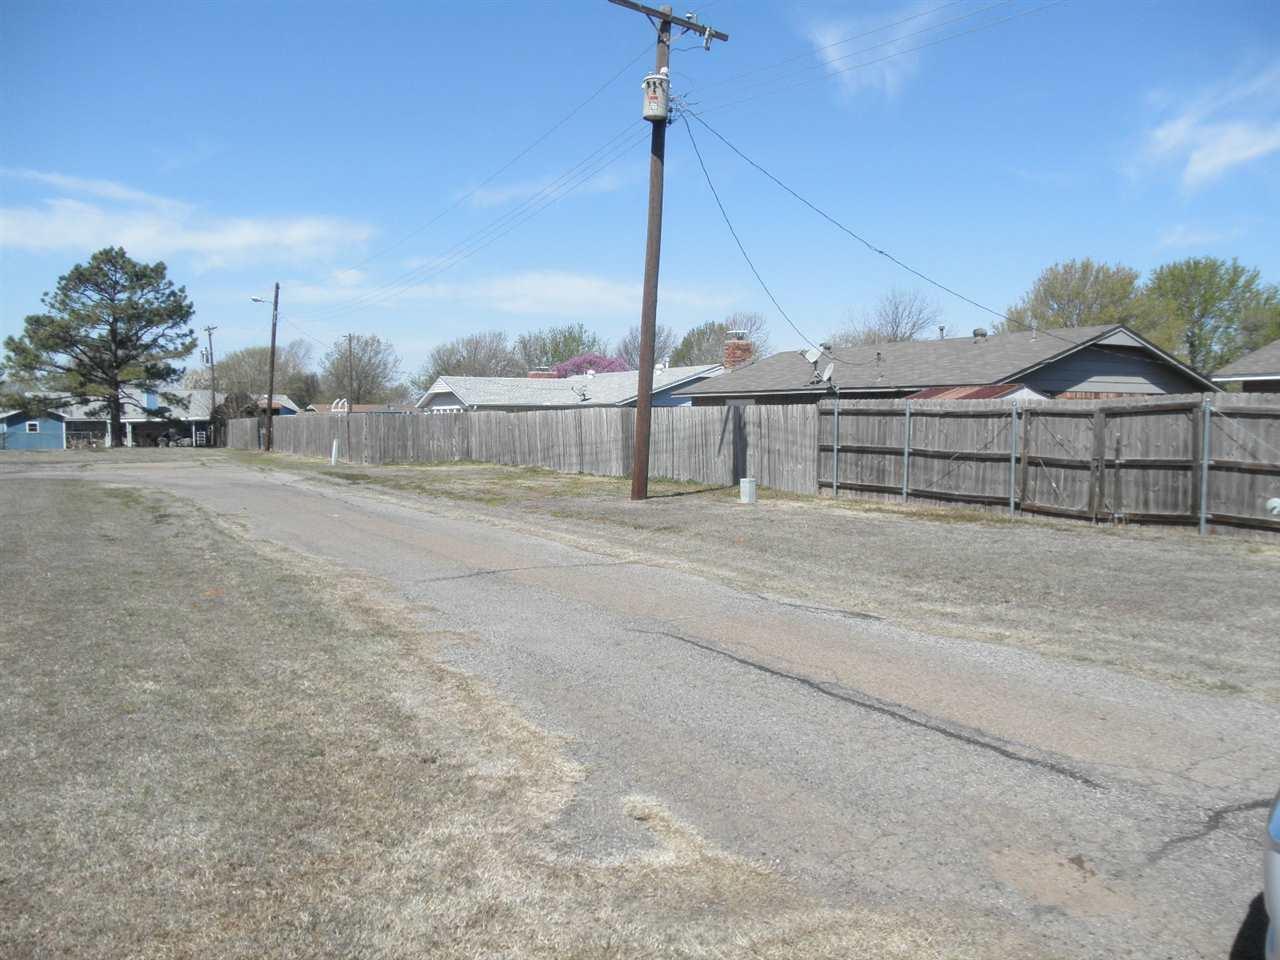 Sold Cross Sale W/ MLS | 300 Lora Ponca City, OK 74601 23